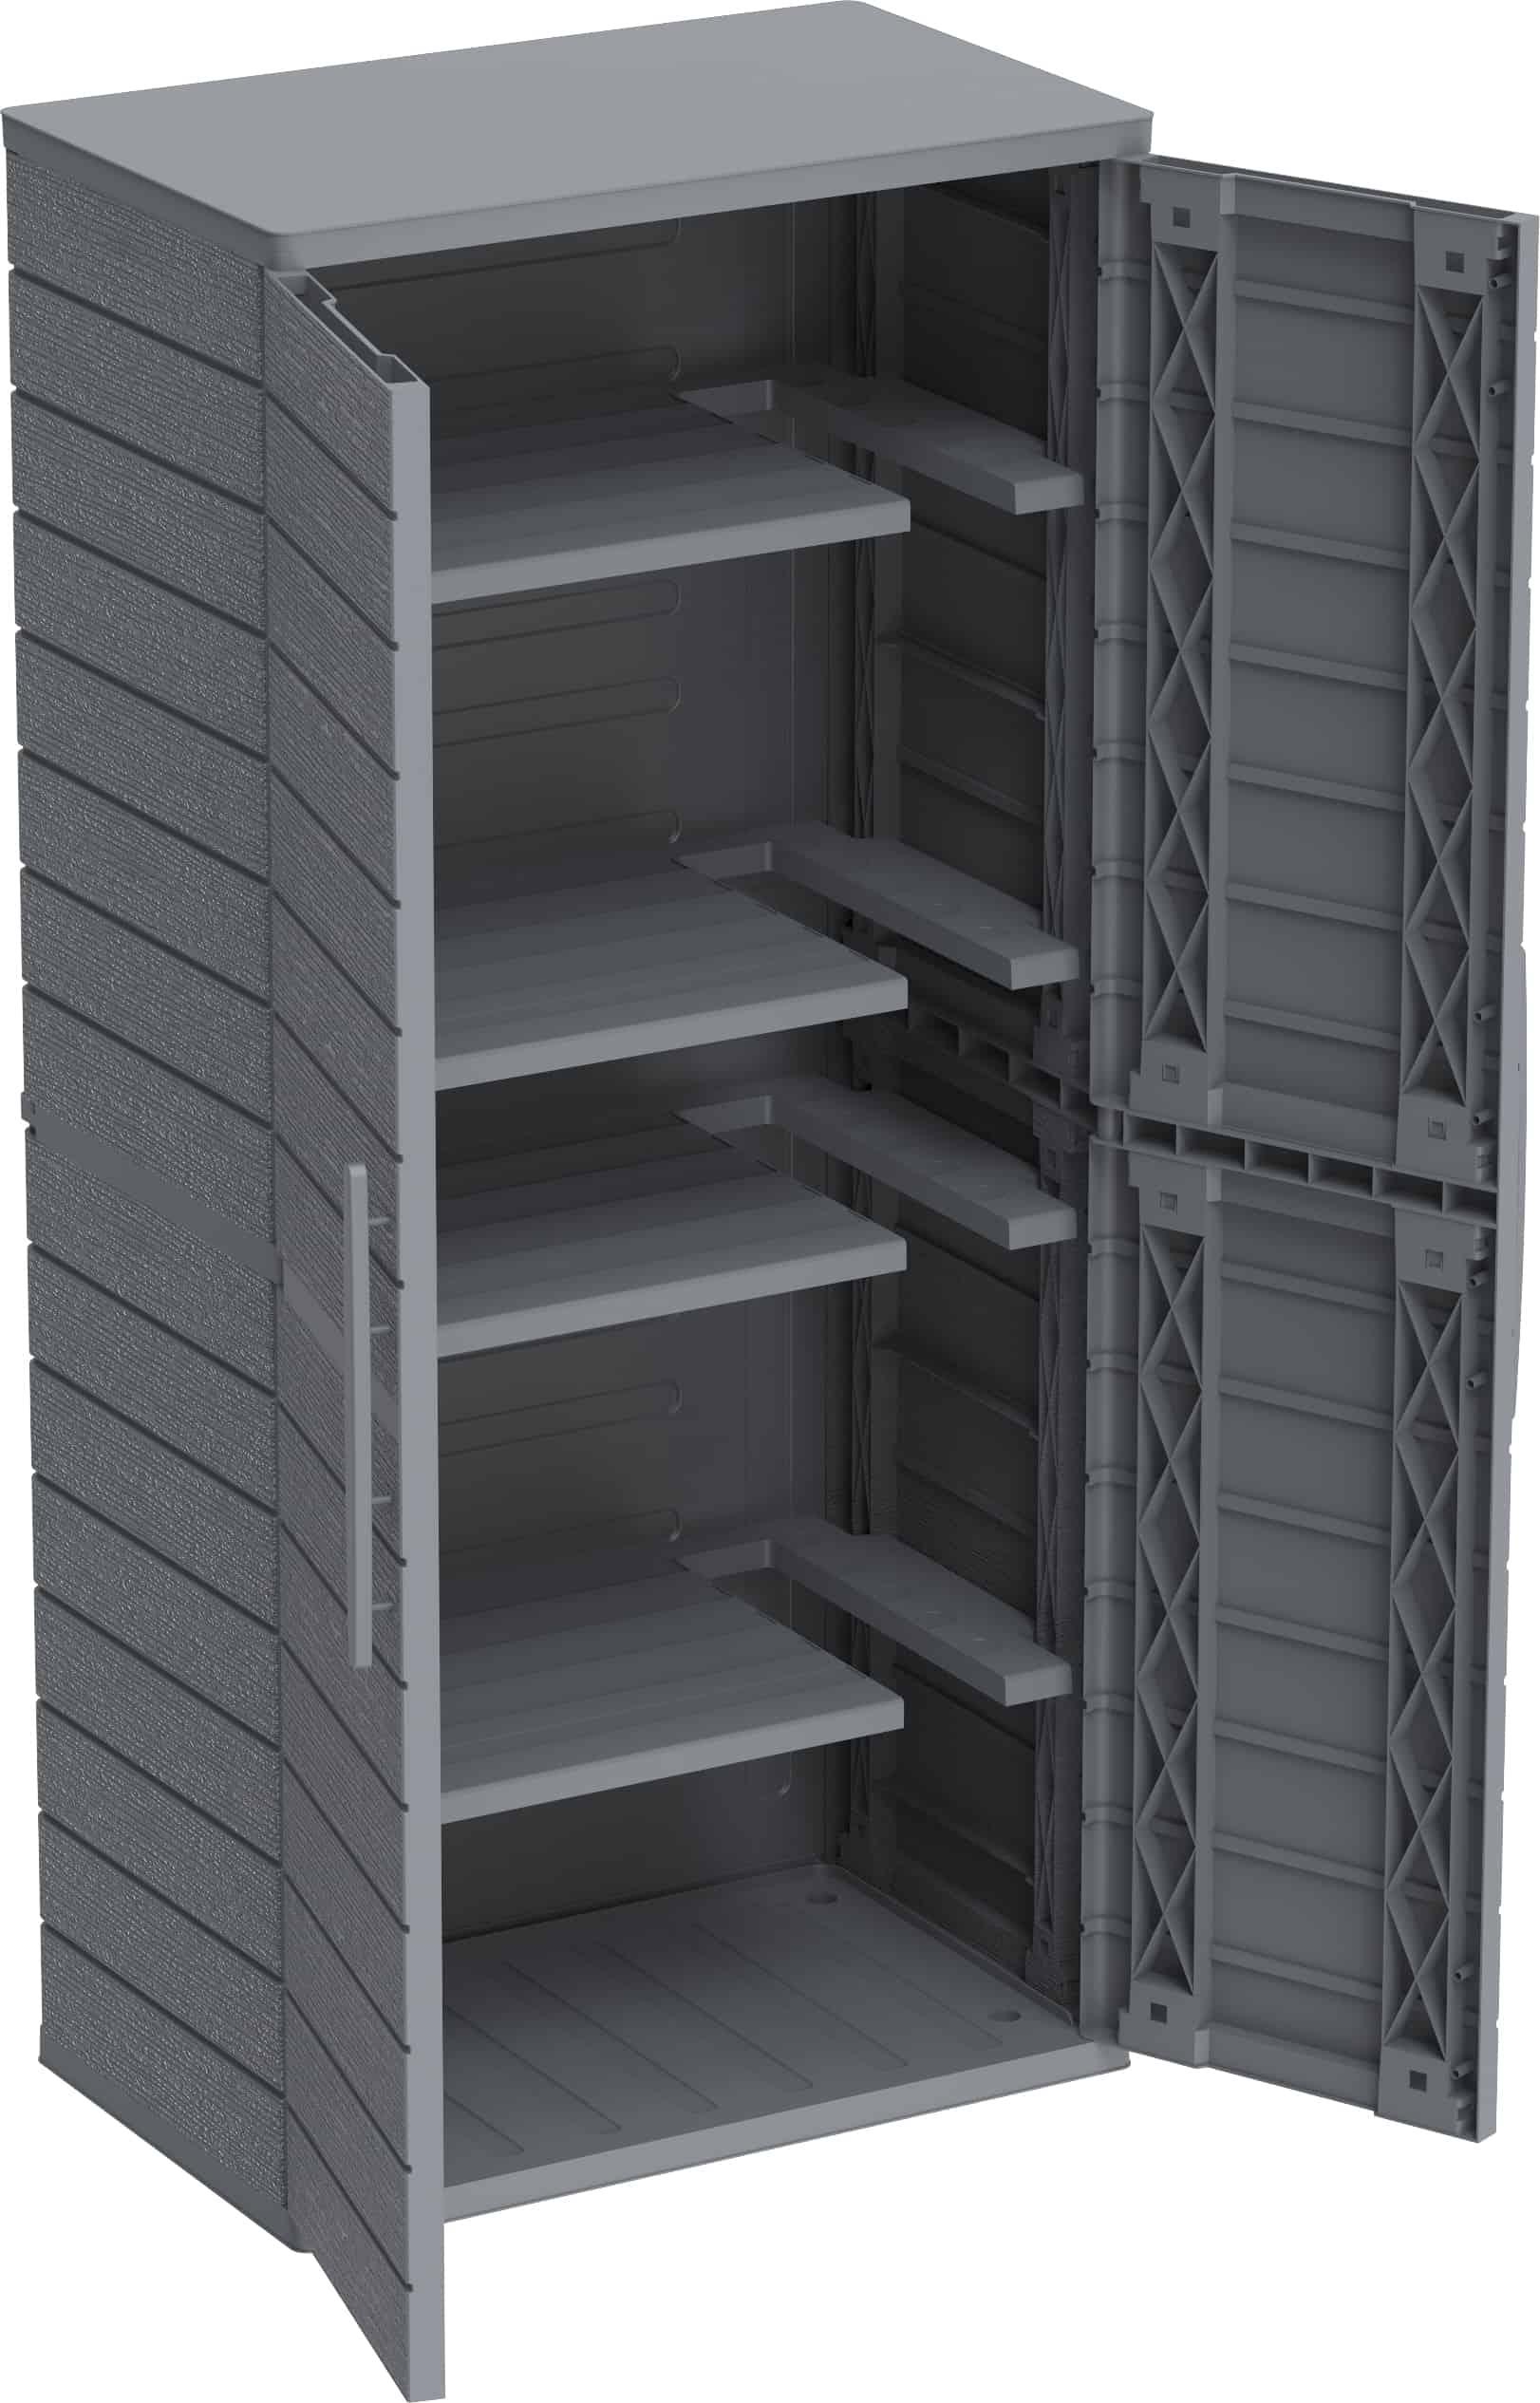 Cedar Grain Vertical Cabinet Tall A